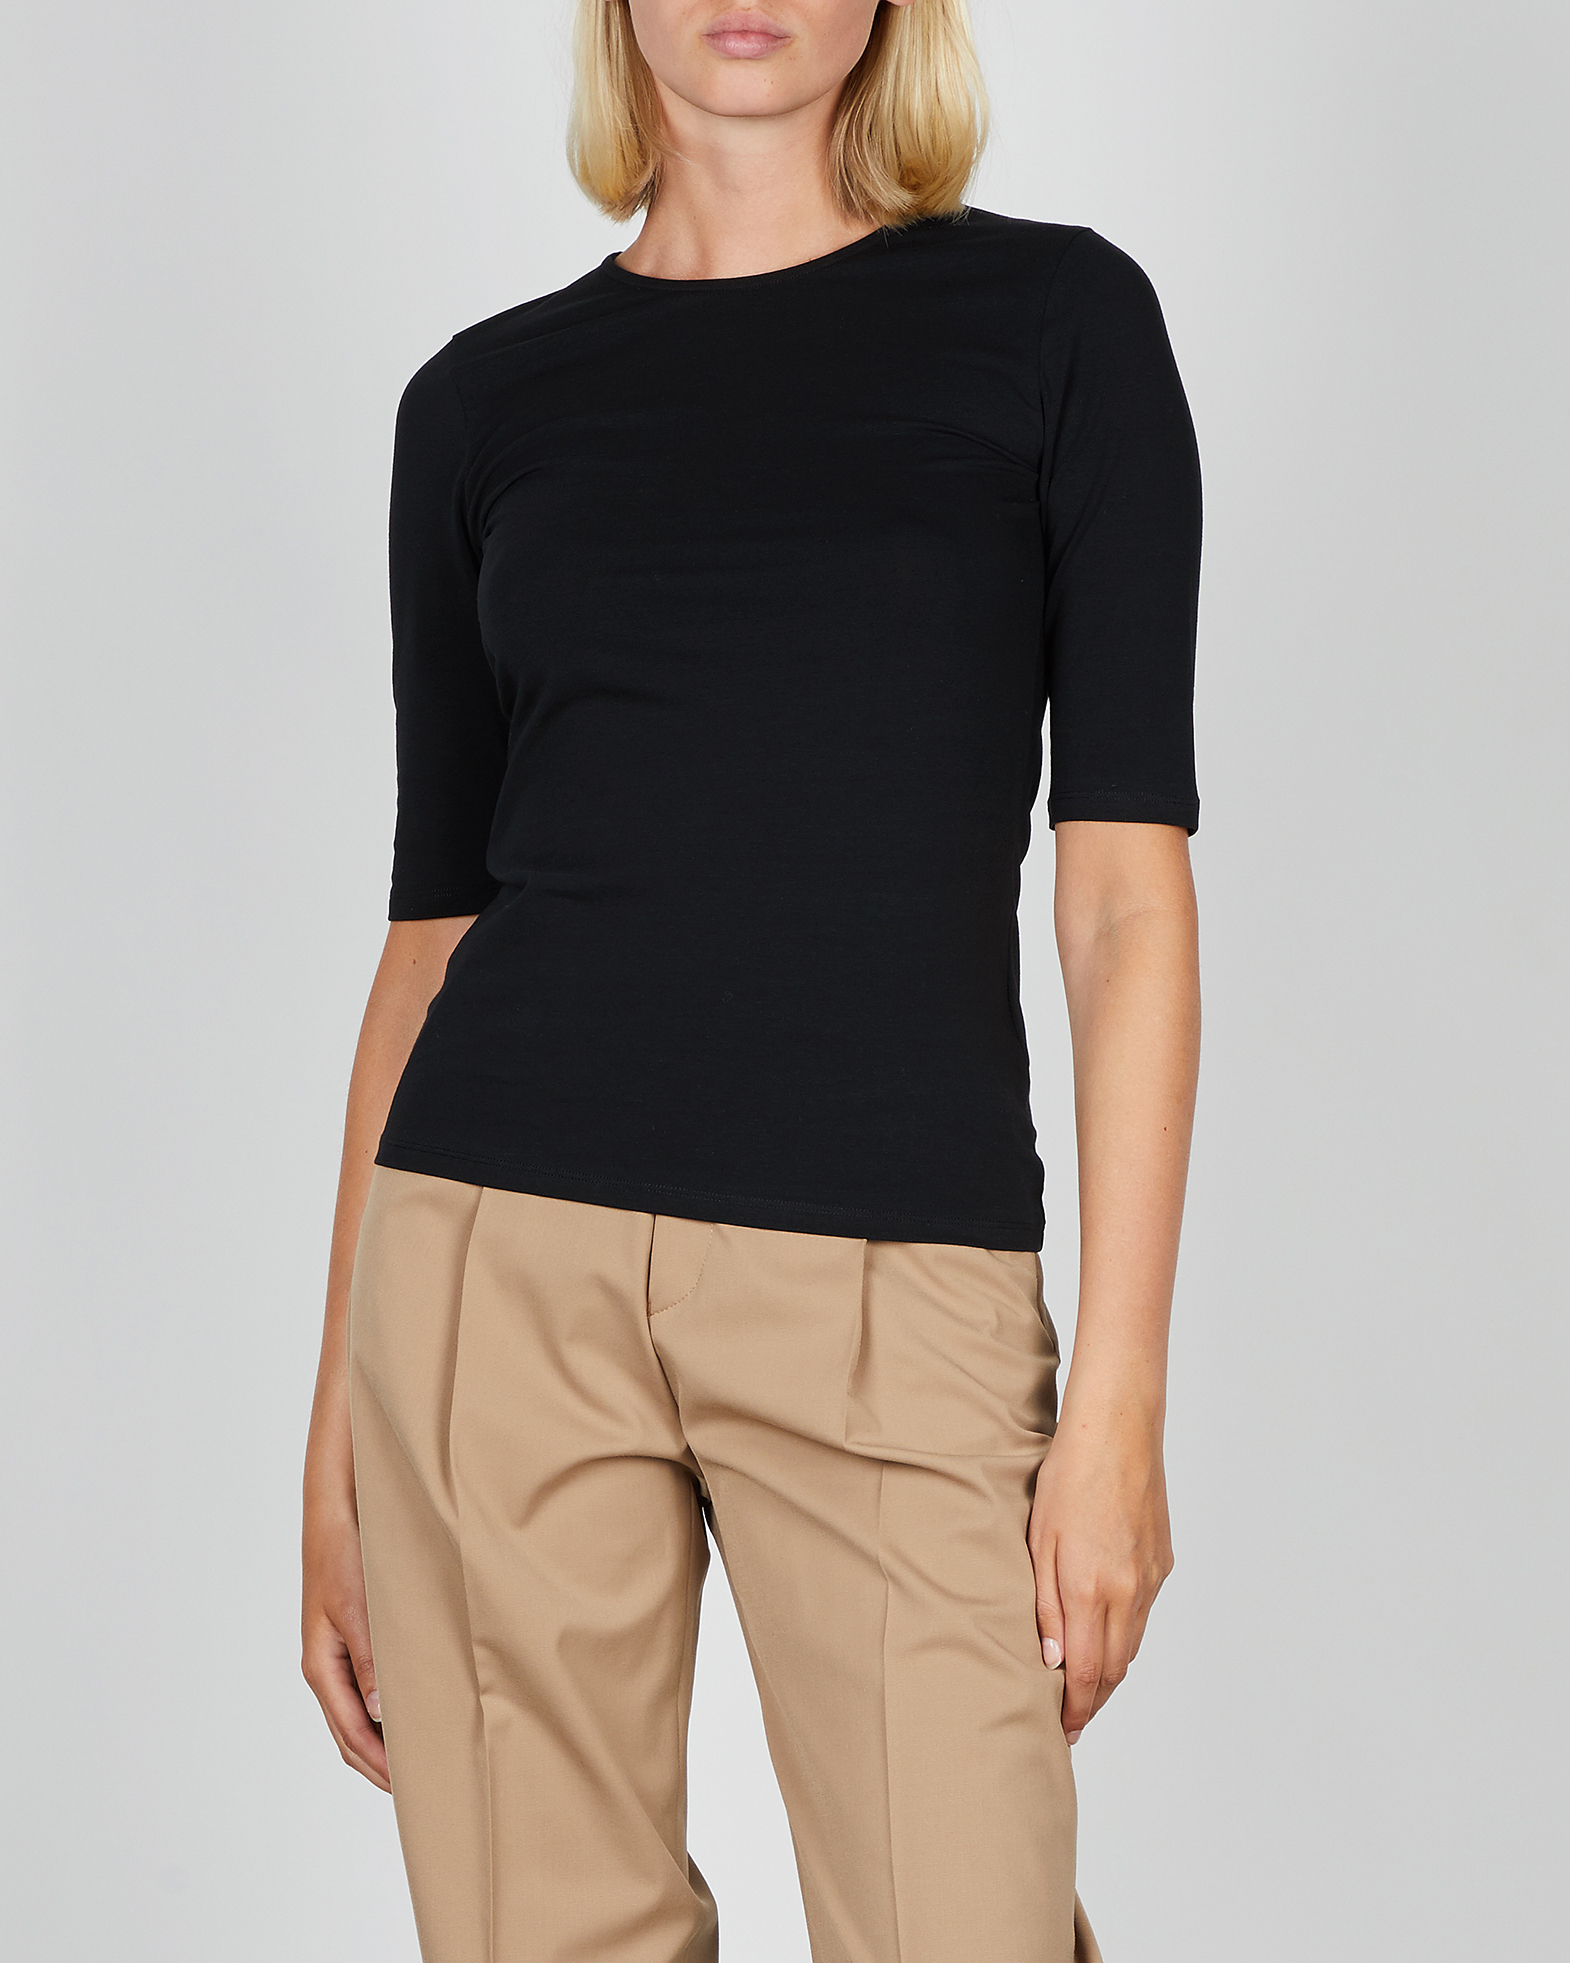 Filippa K Topp Cotton Stretch Elbow Sleeve svart XS